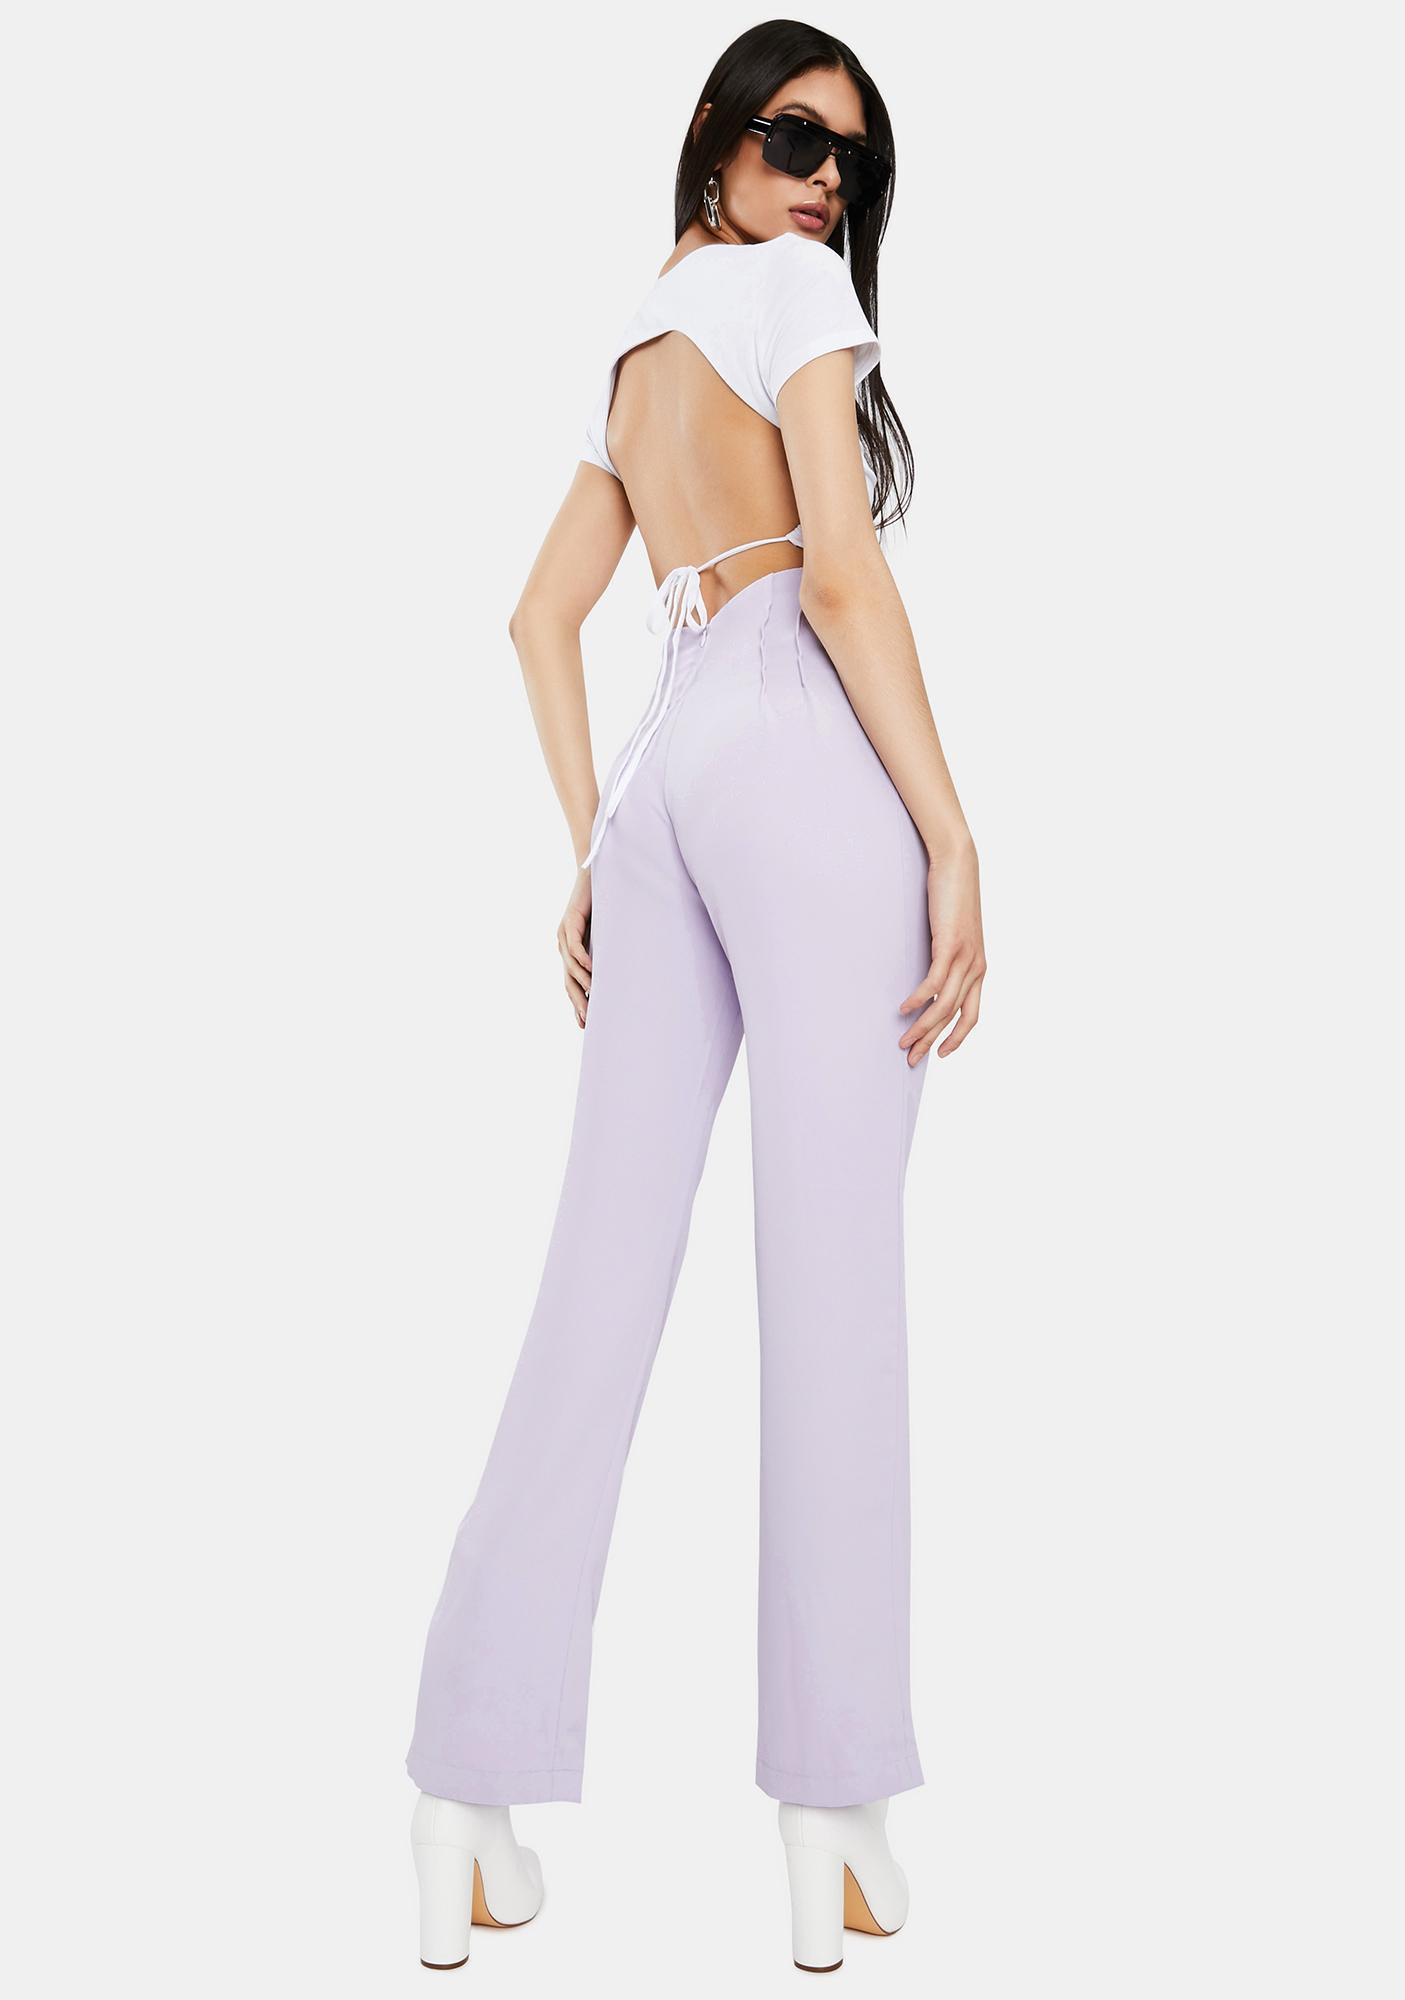 THE KRIPT Lavender Polly High Waist Pants